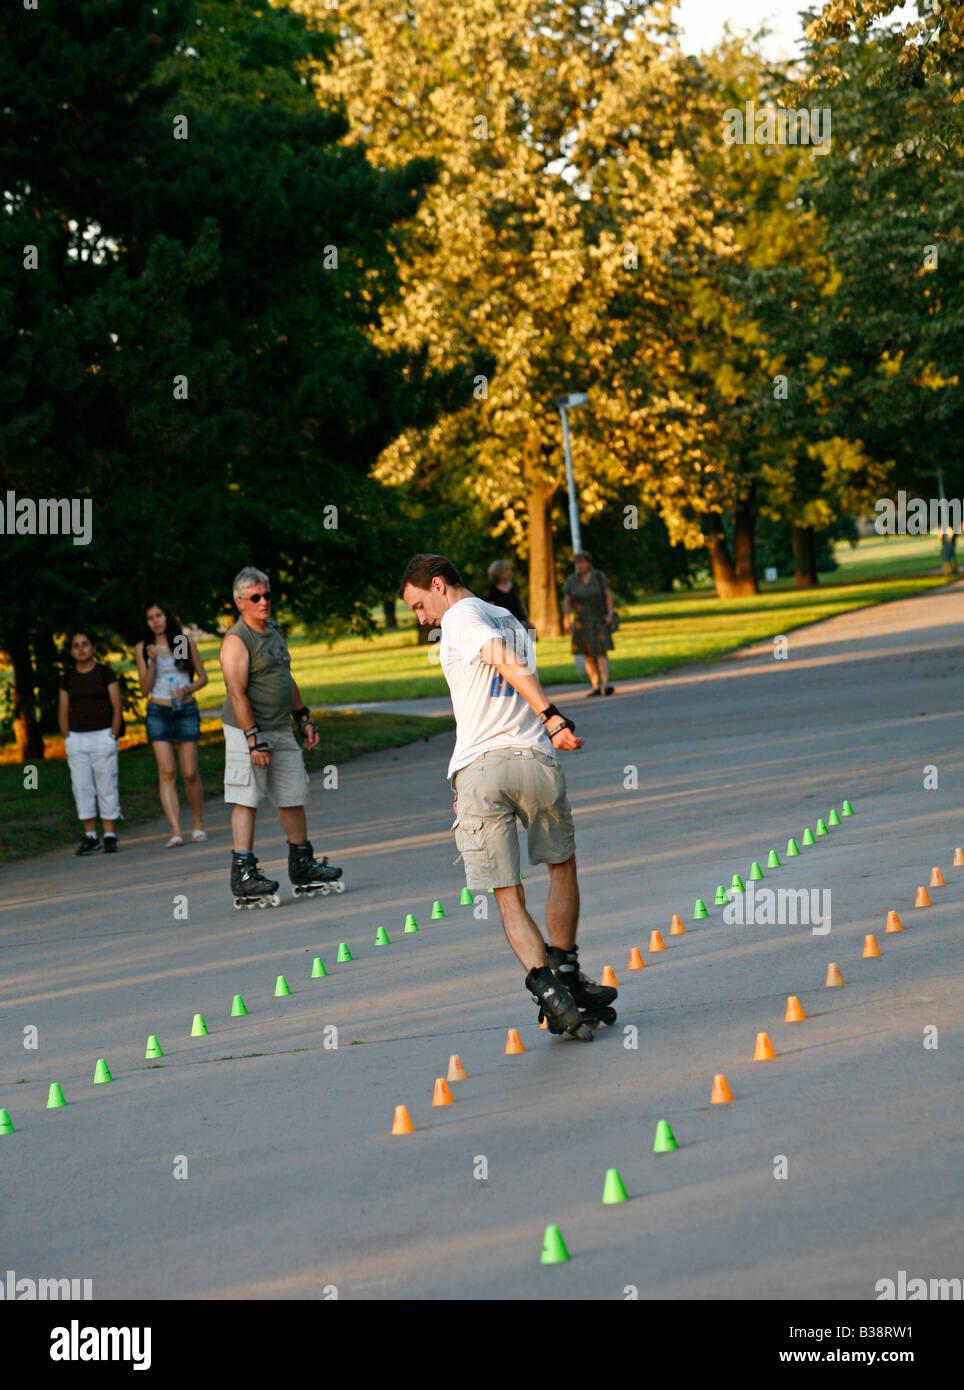 Aug 2008 - People Skating at Letna Park Prague Czech Republic Stock Photo